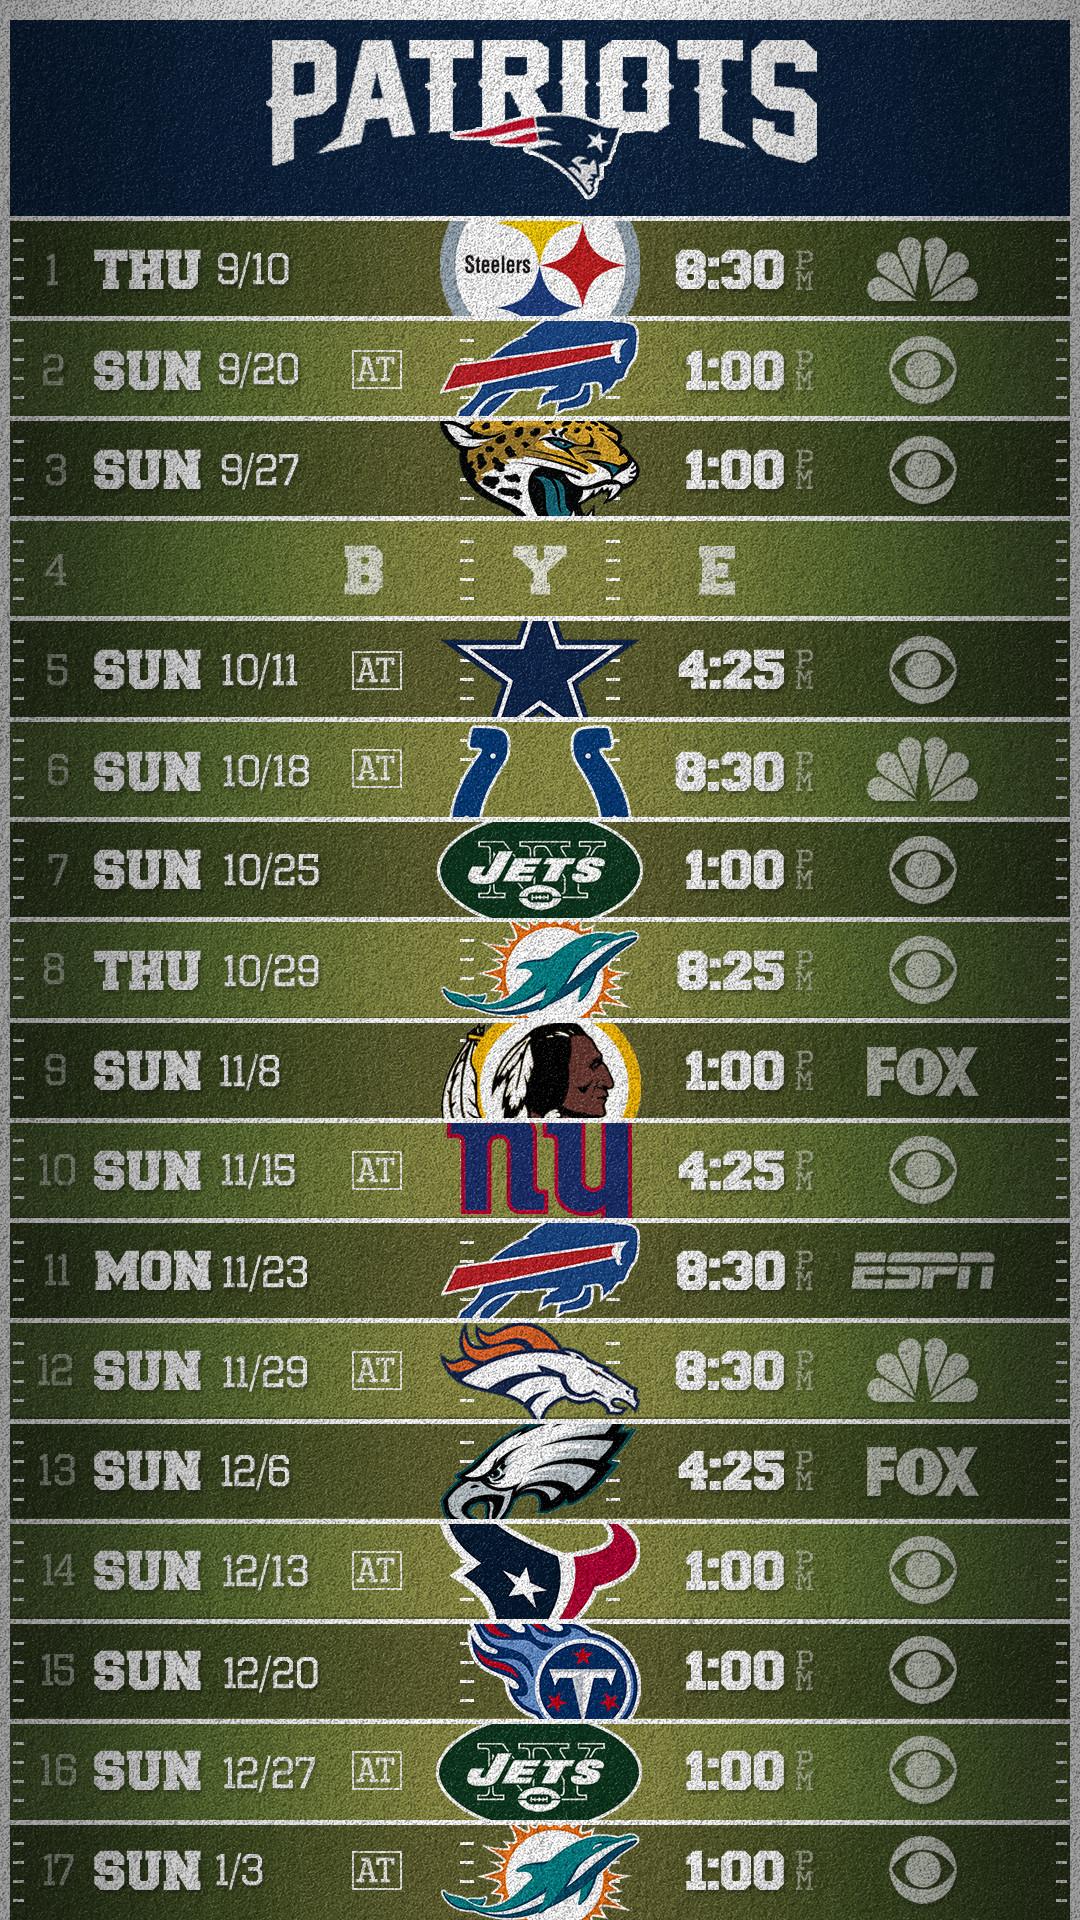 Patriots 2015 Mobile Schedule wallpaper (credit to /u/dbeat who made the  original 2014 version) …